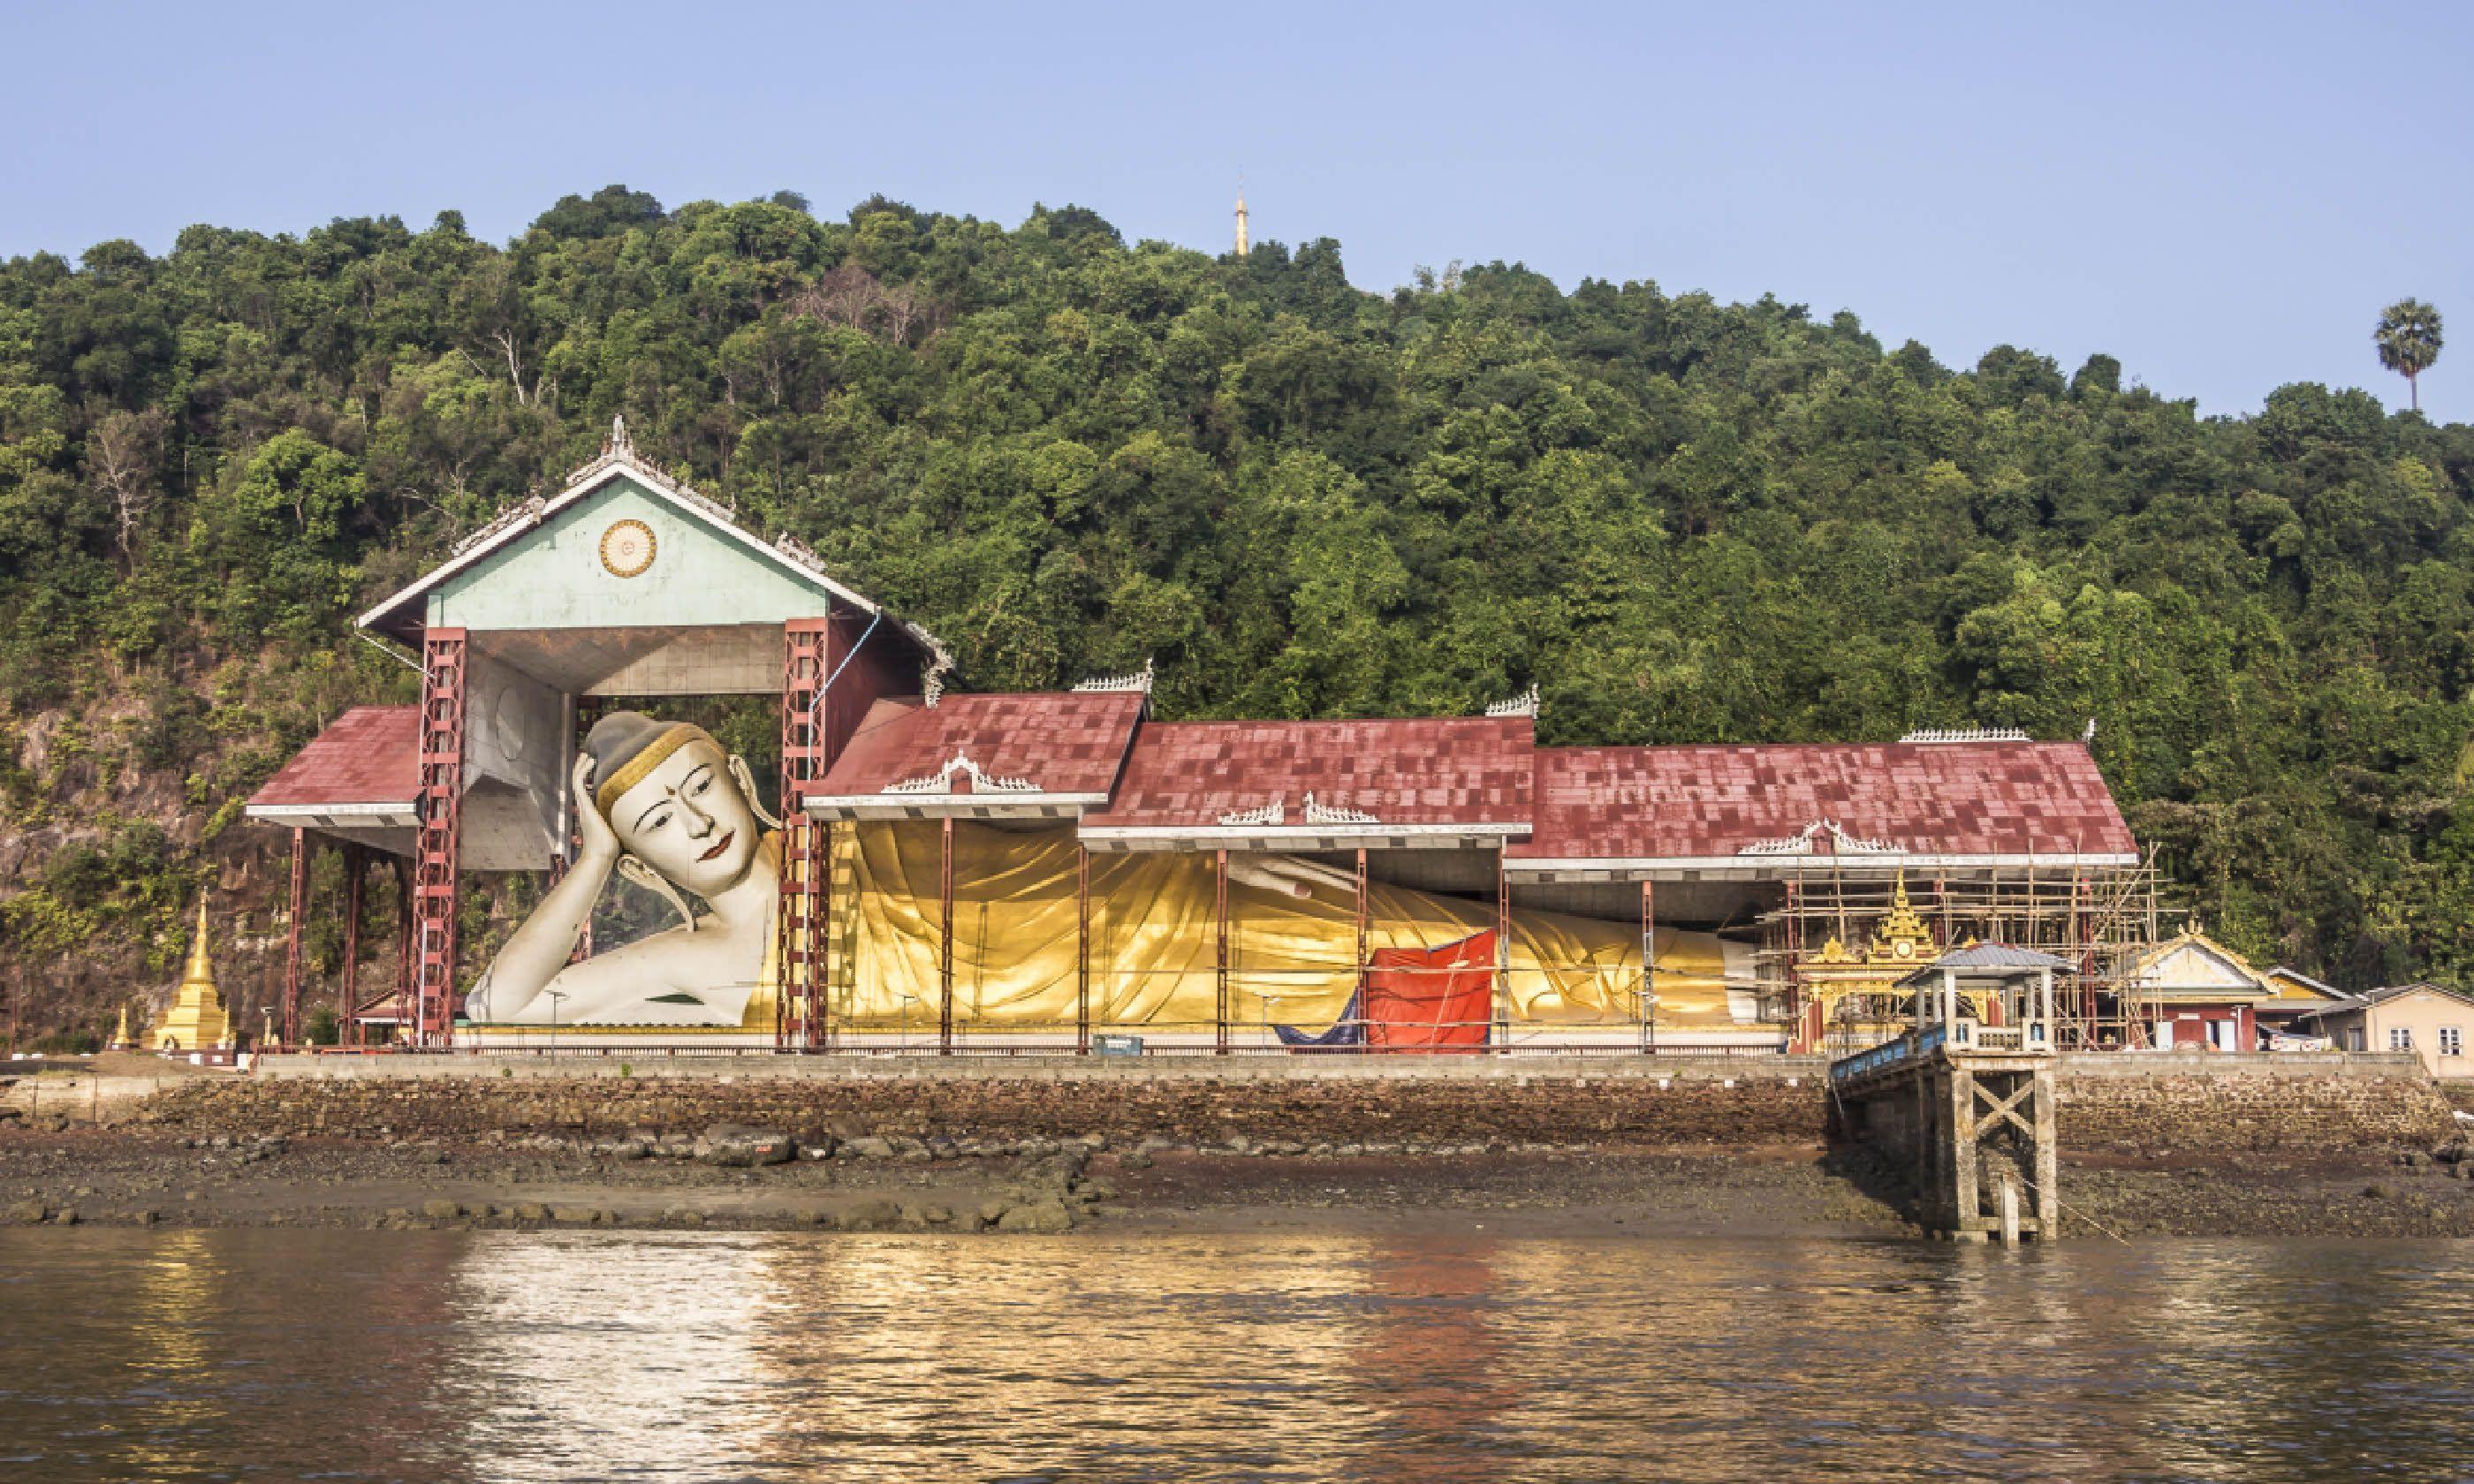 Giant reclining Buddha at the harbor of Myeik (Shutterstock)